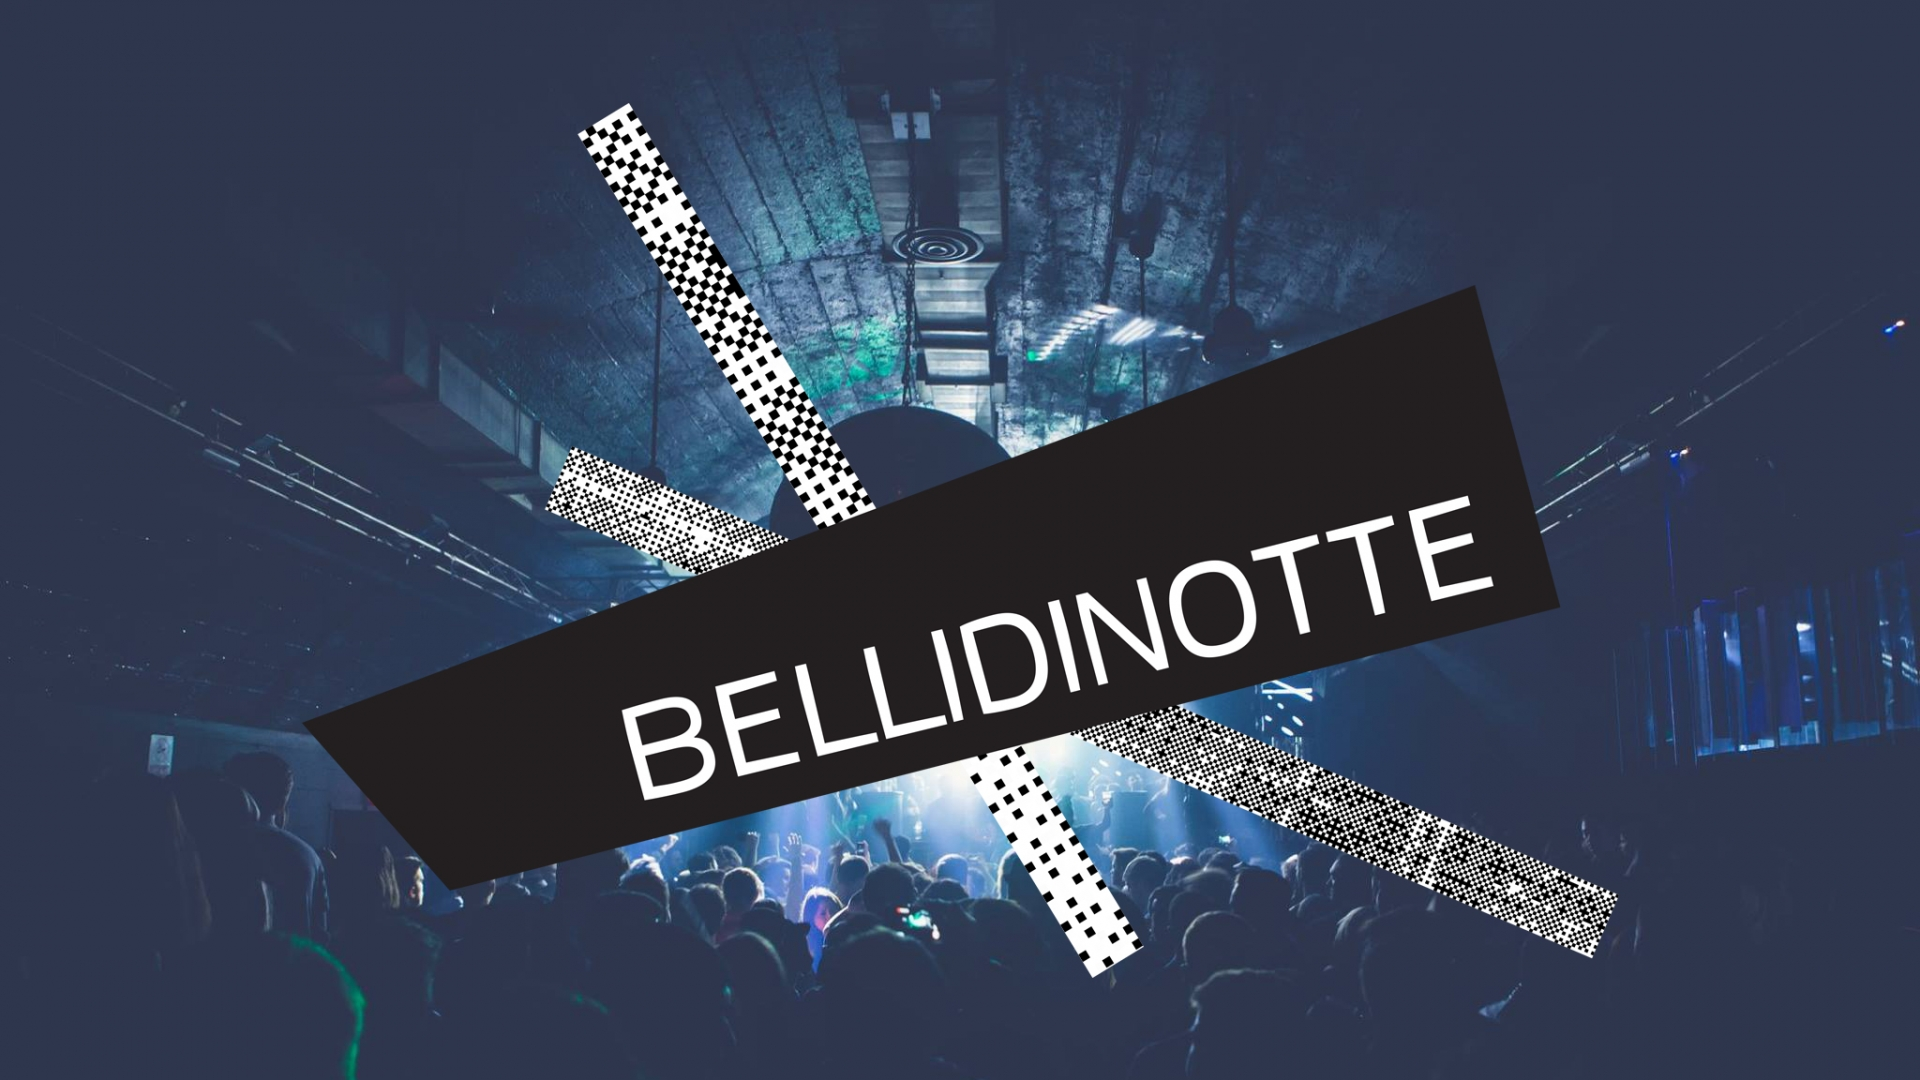 Contest: Bellidinotte